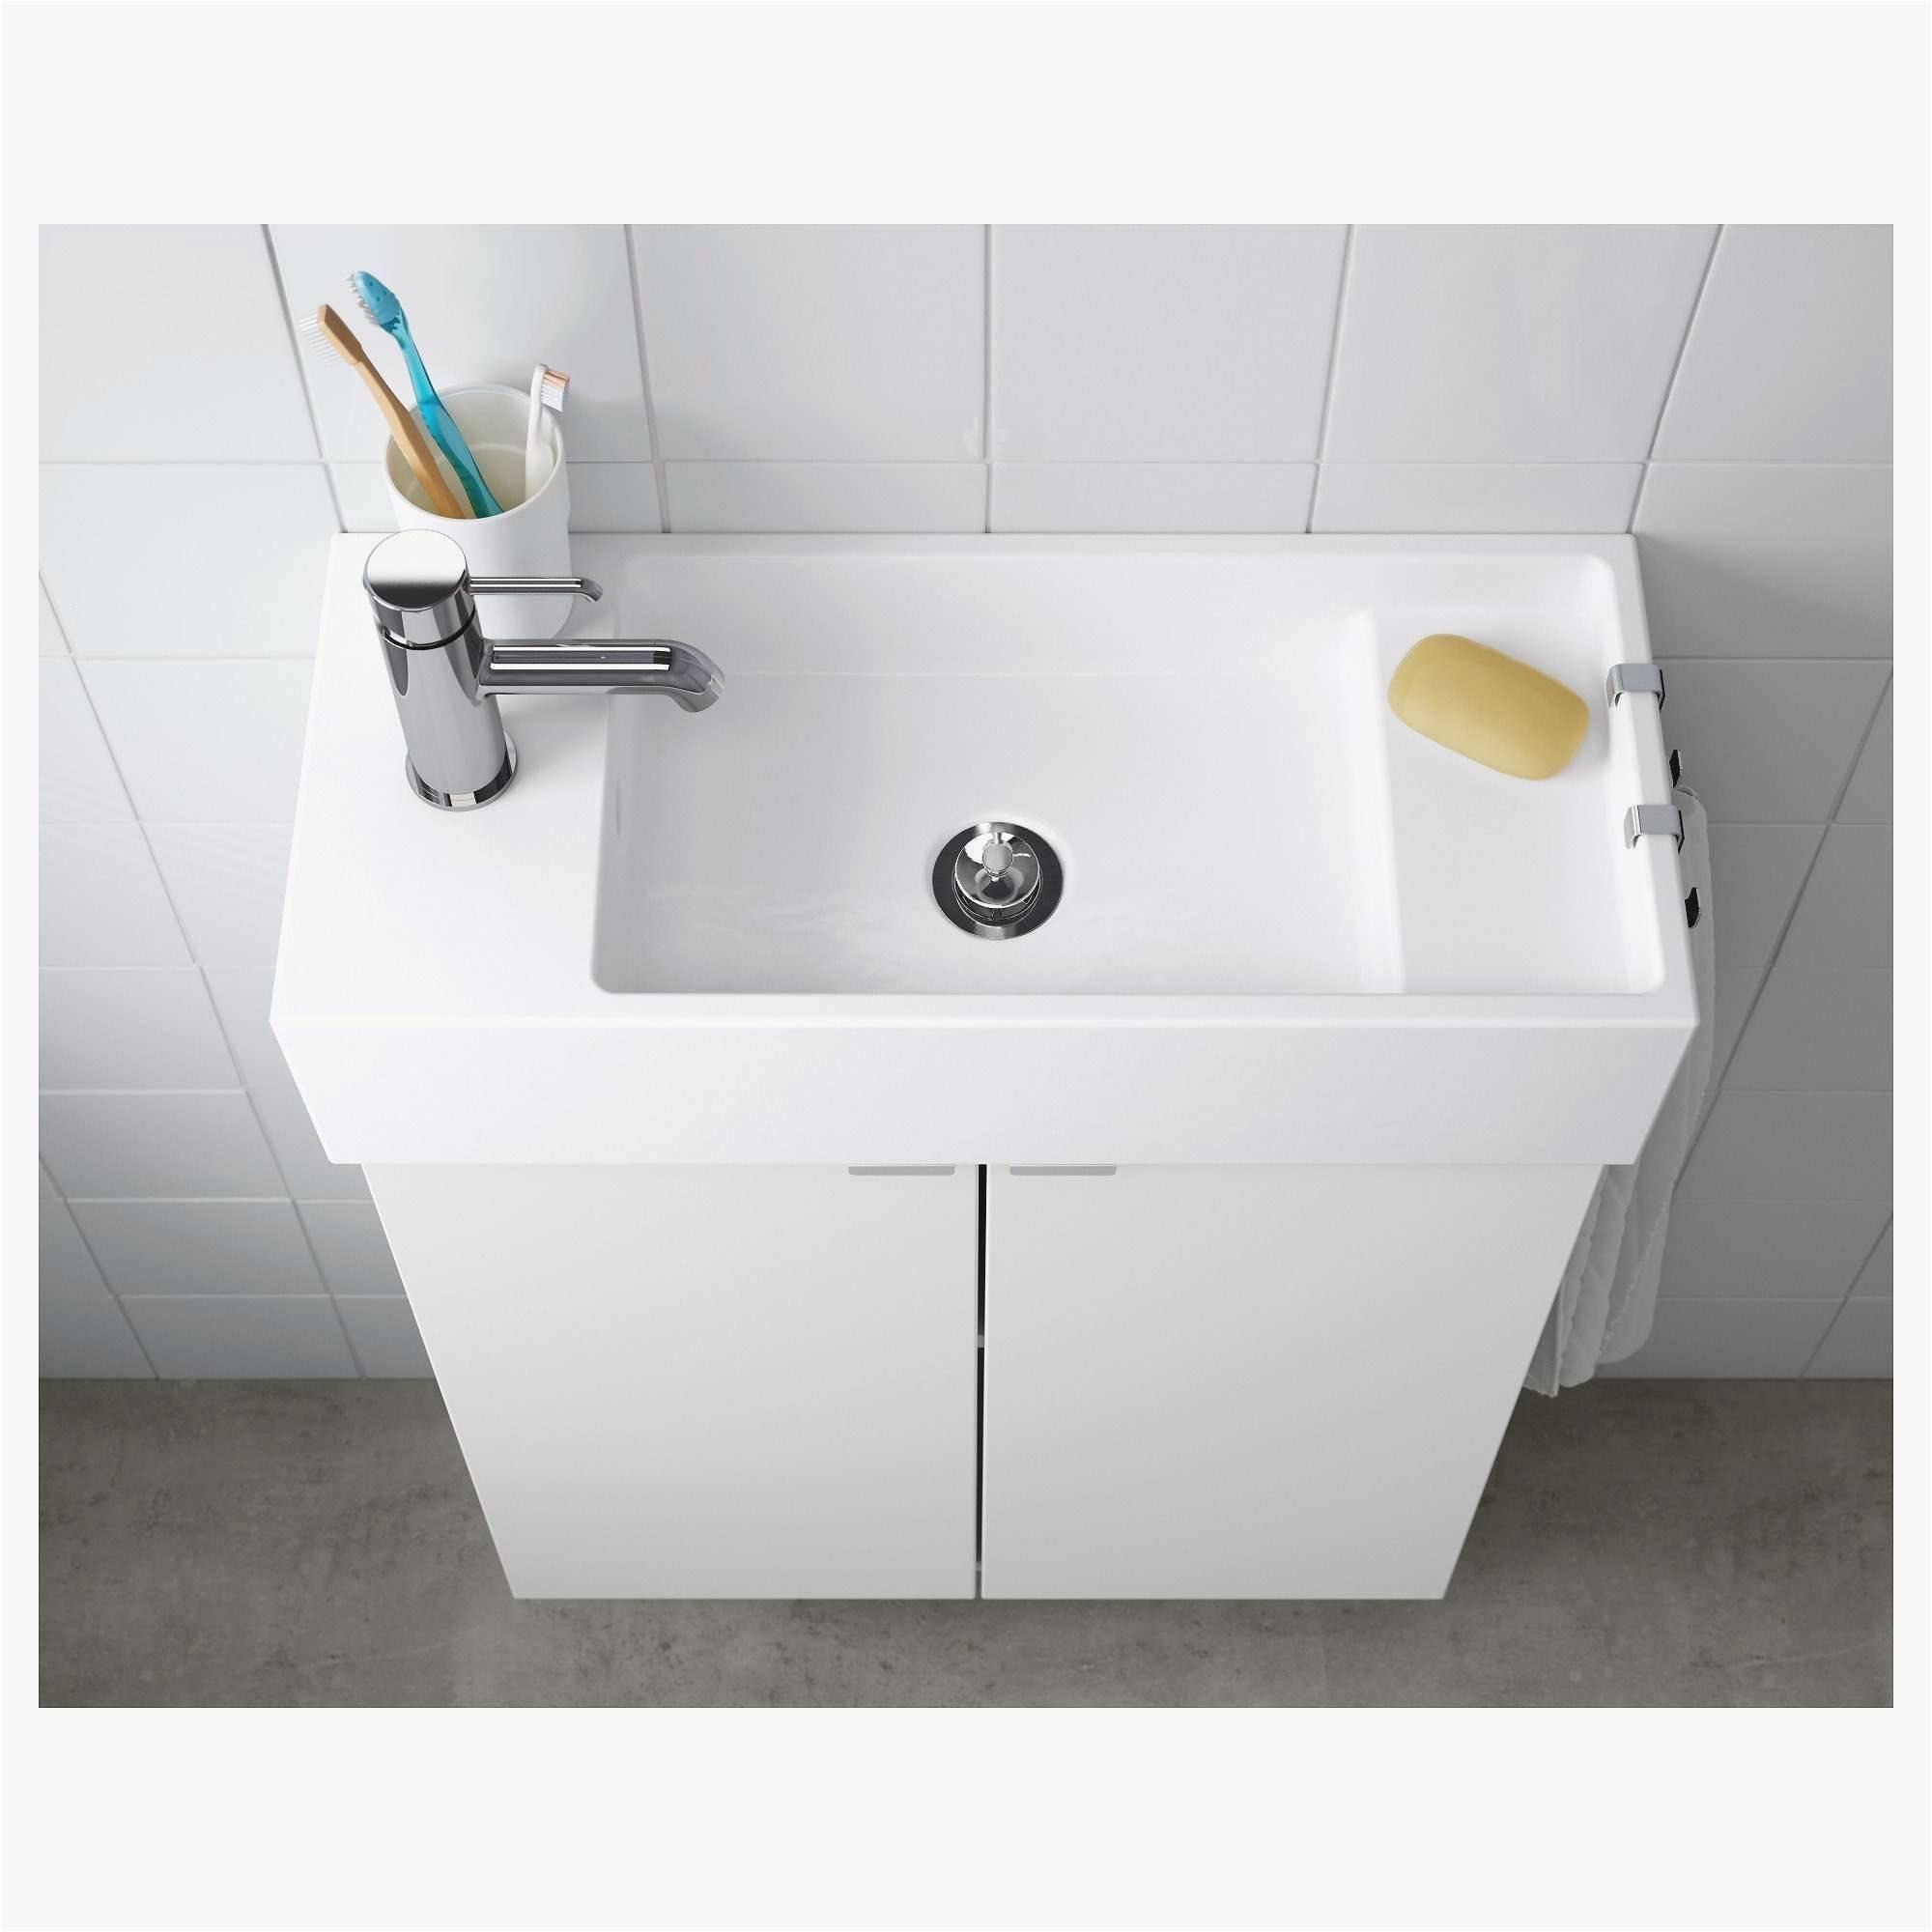 Cheap Small Bathroom Sinks Fresh Pe S5h Sink Ikea Small I 0d Awesome Design Ideas